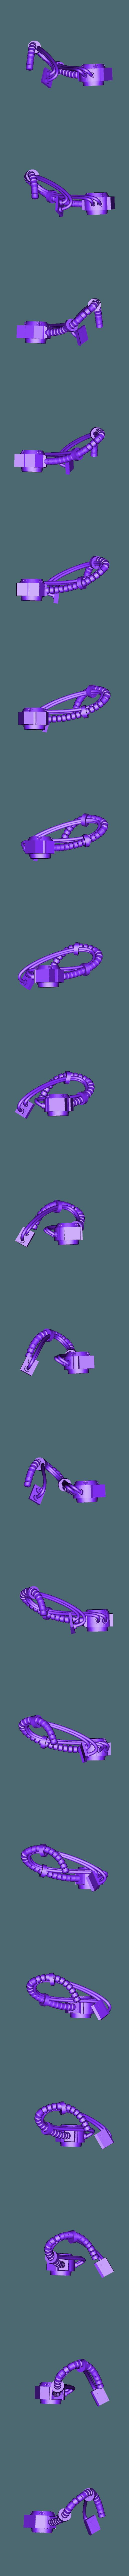 Sgt_1_Right_Hoses.stl Download free STL file Flame Armed Instigators • 3D printable template, danny_cyanide